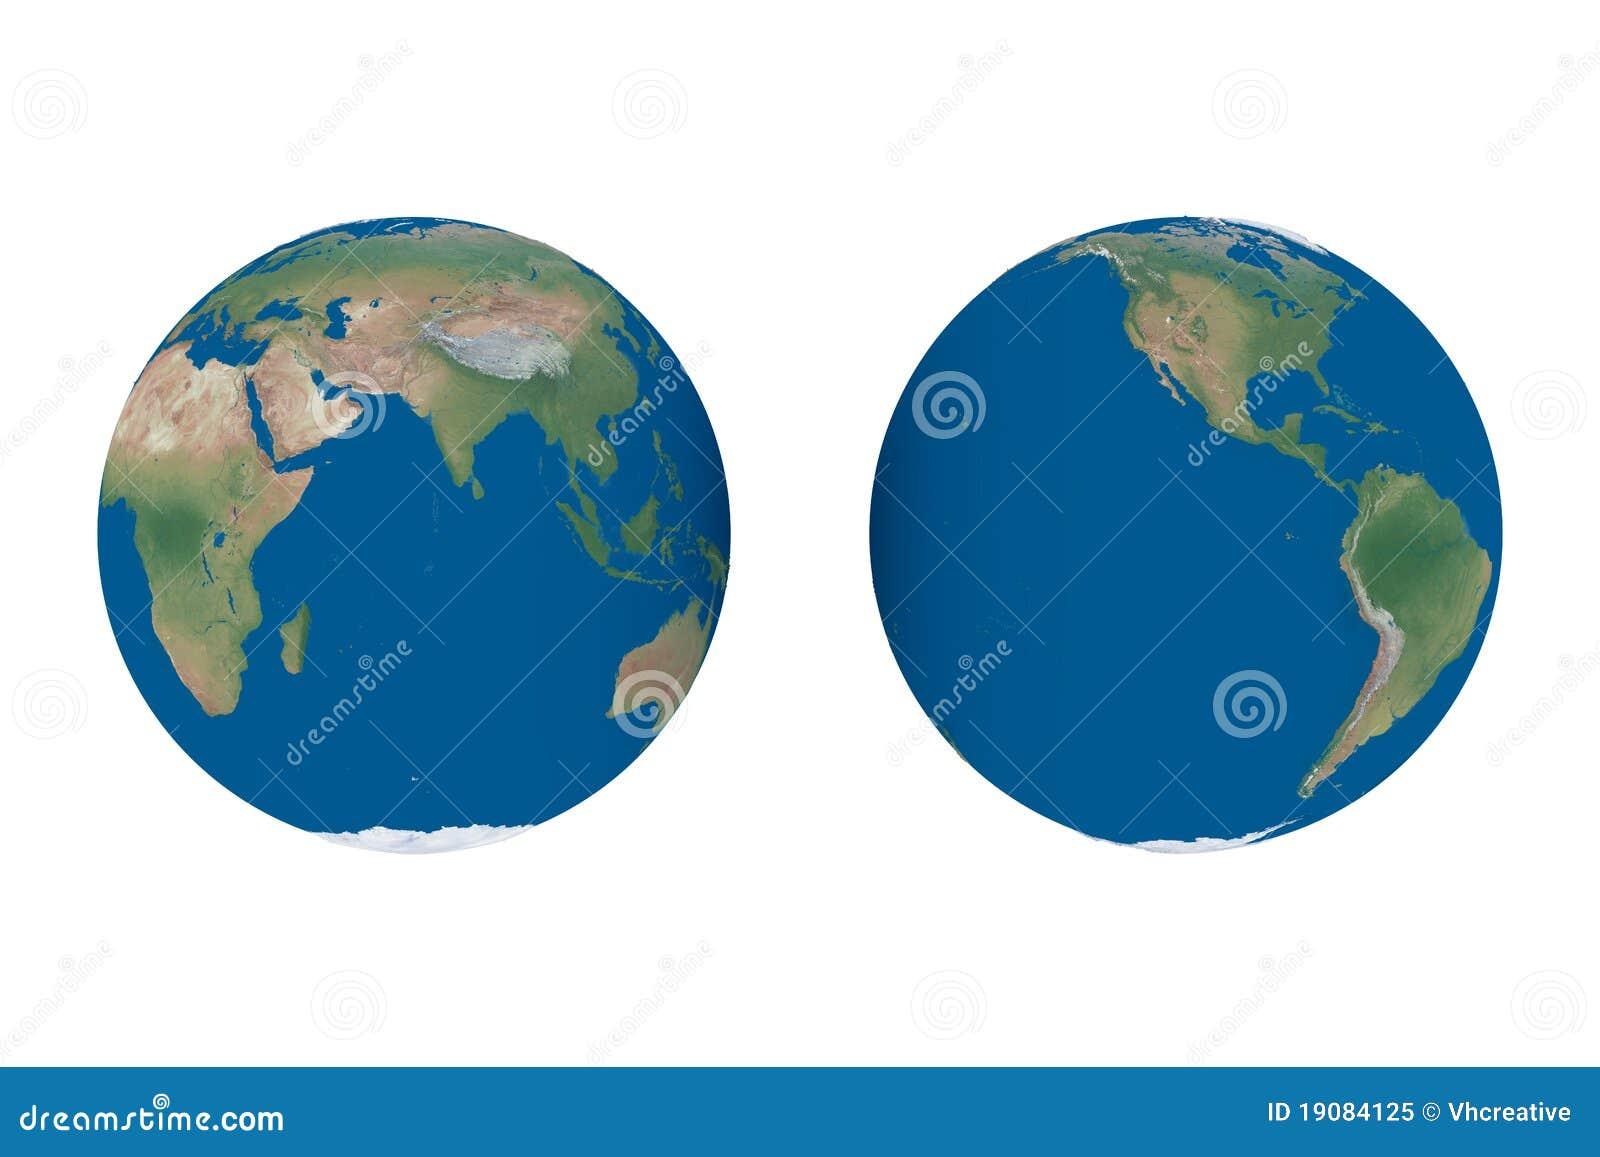 World map globe hemispheres stock illustration illustration of download world map globe hemispheres stock illustration illustration of eurasian africa 19084125 gumiabroncs Gallery